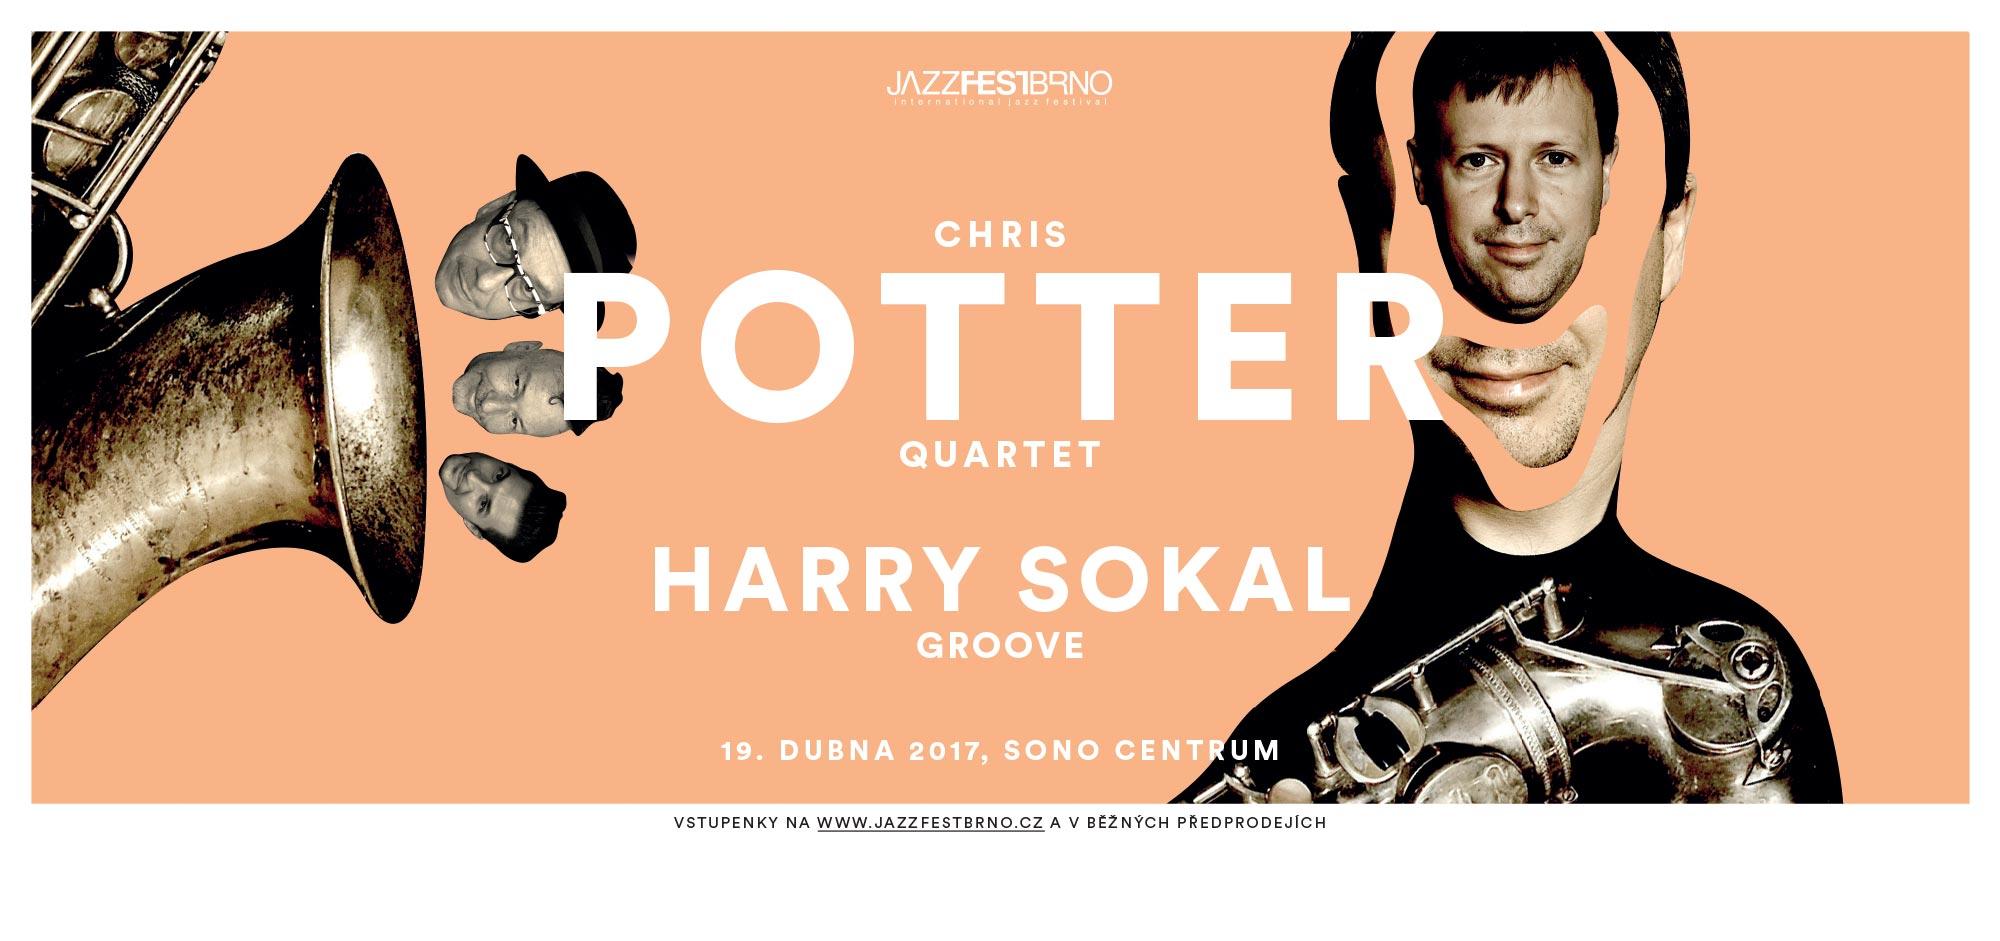 Jazzfestbrno 2017 - Chris Potter